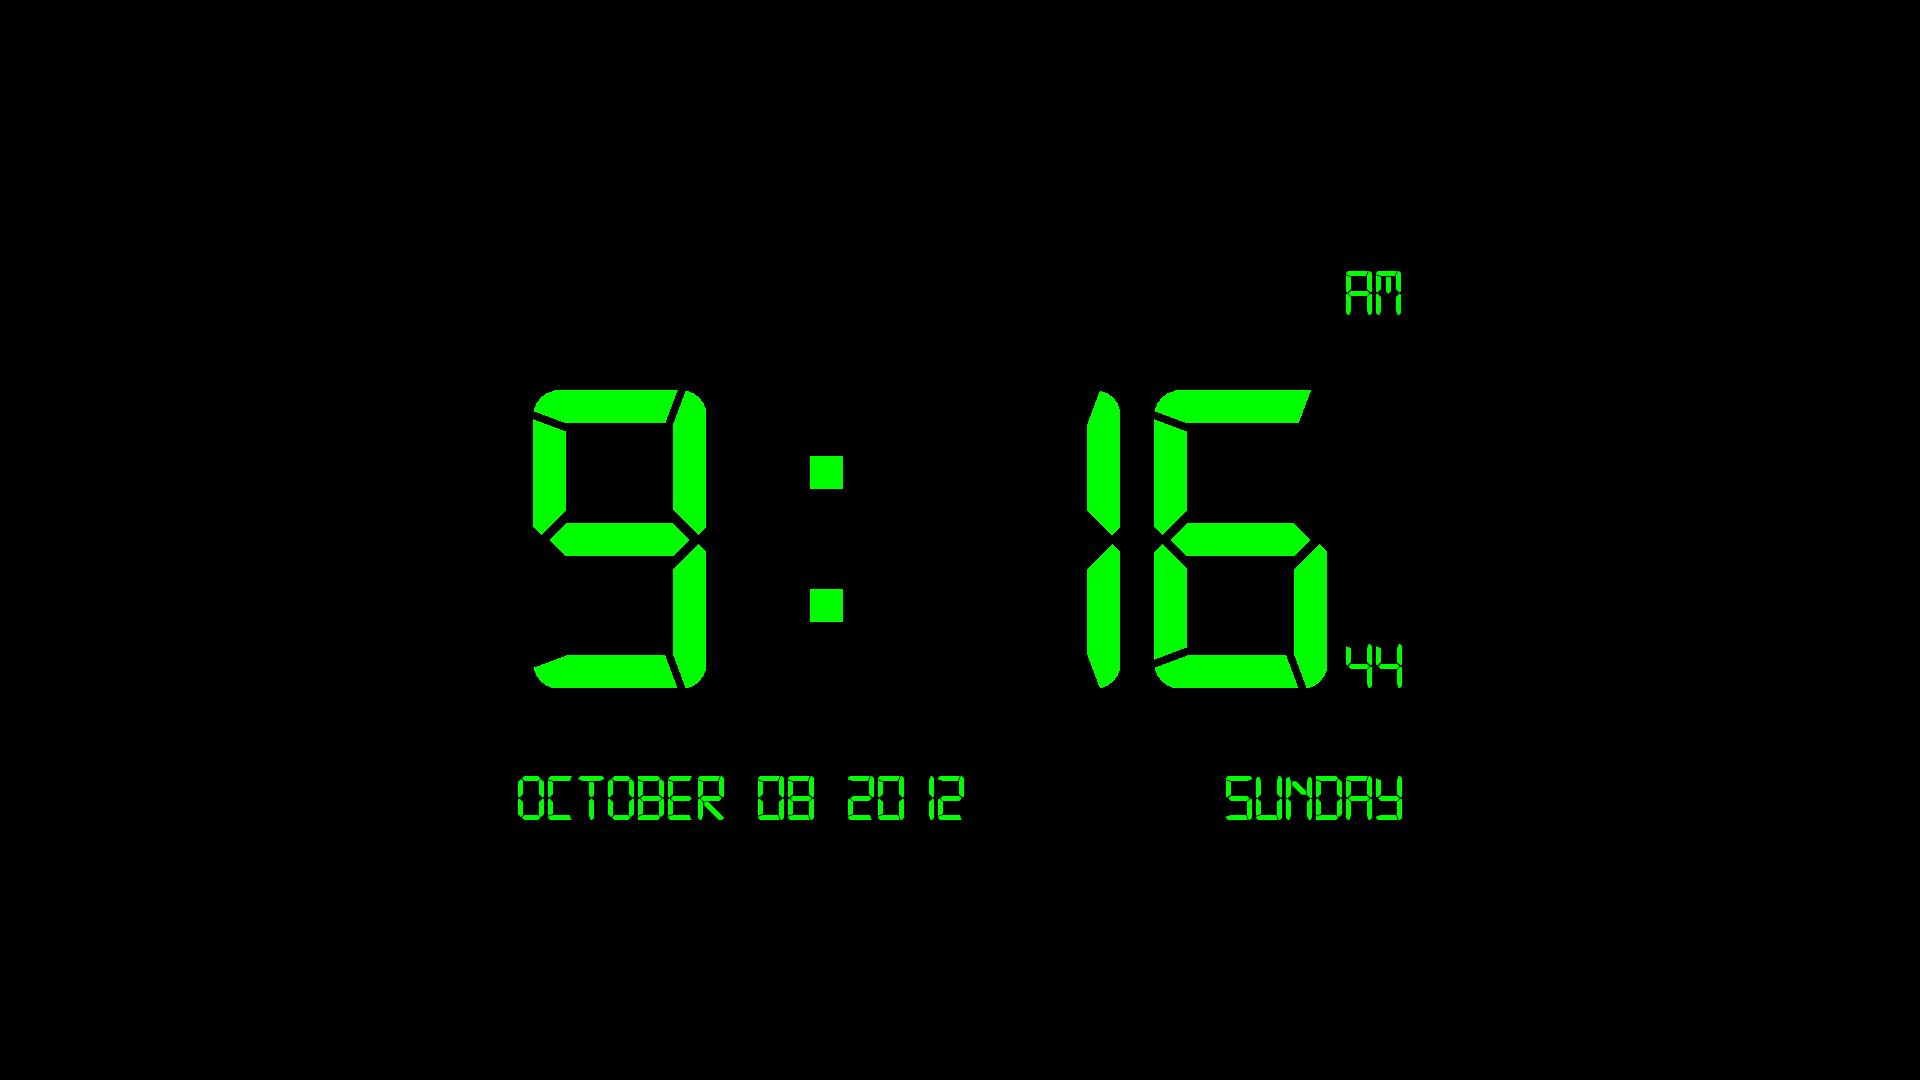 50+] Wallpaper Clock Windows 10 on WallpaperSafari